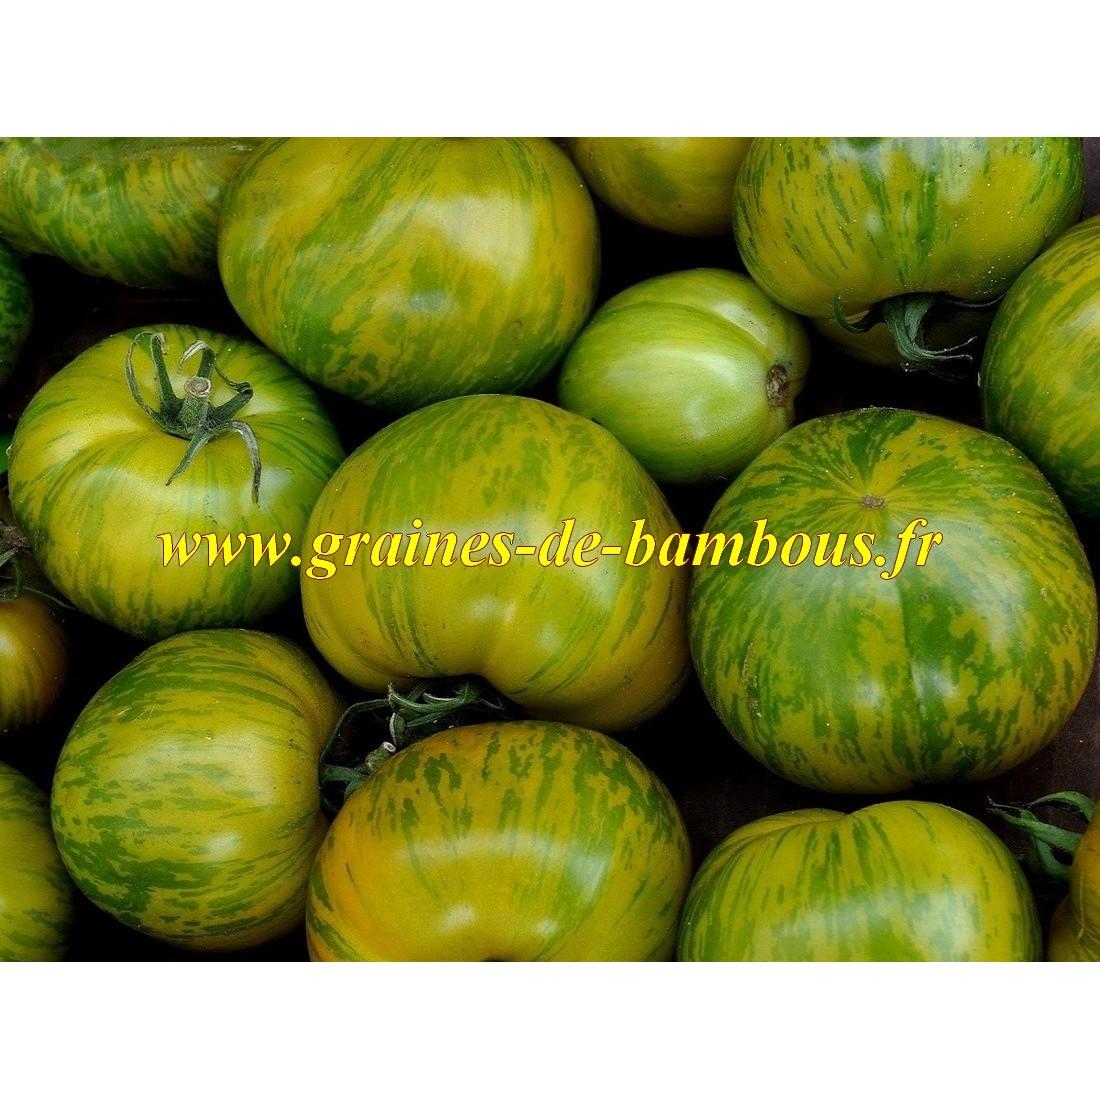 Green zebra tomate graines de bambous fr